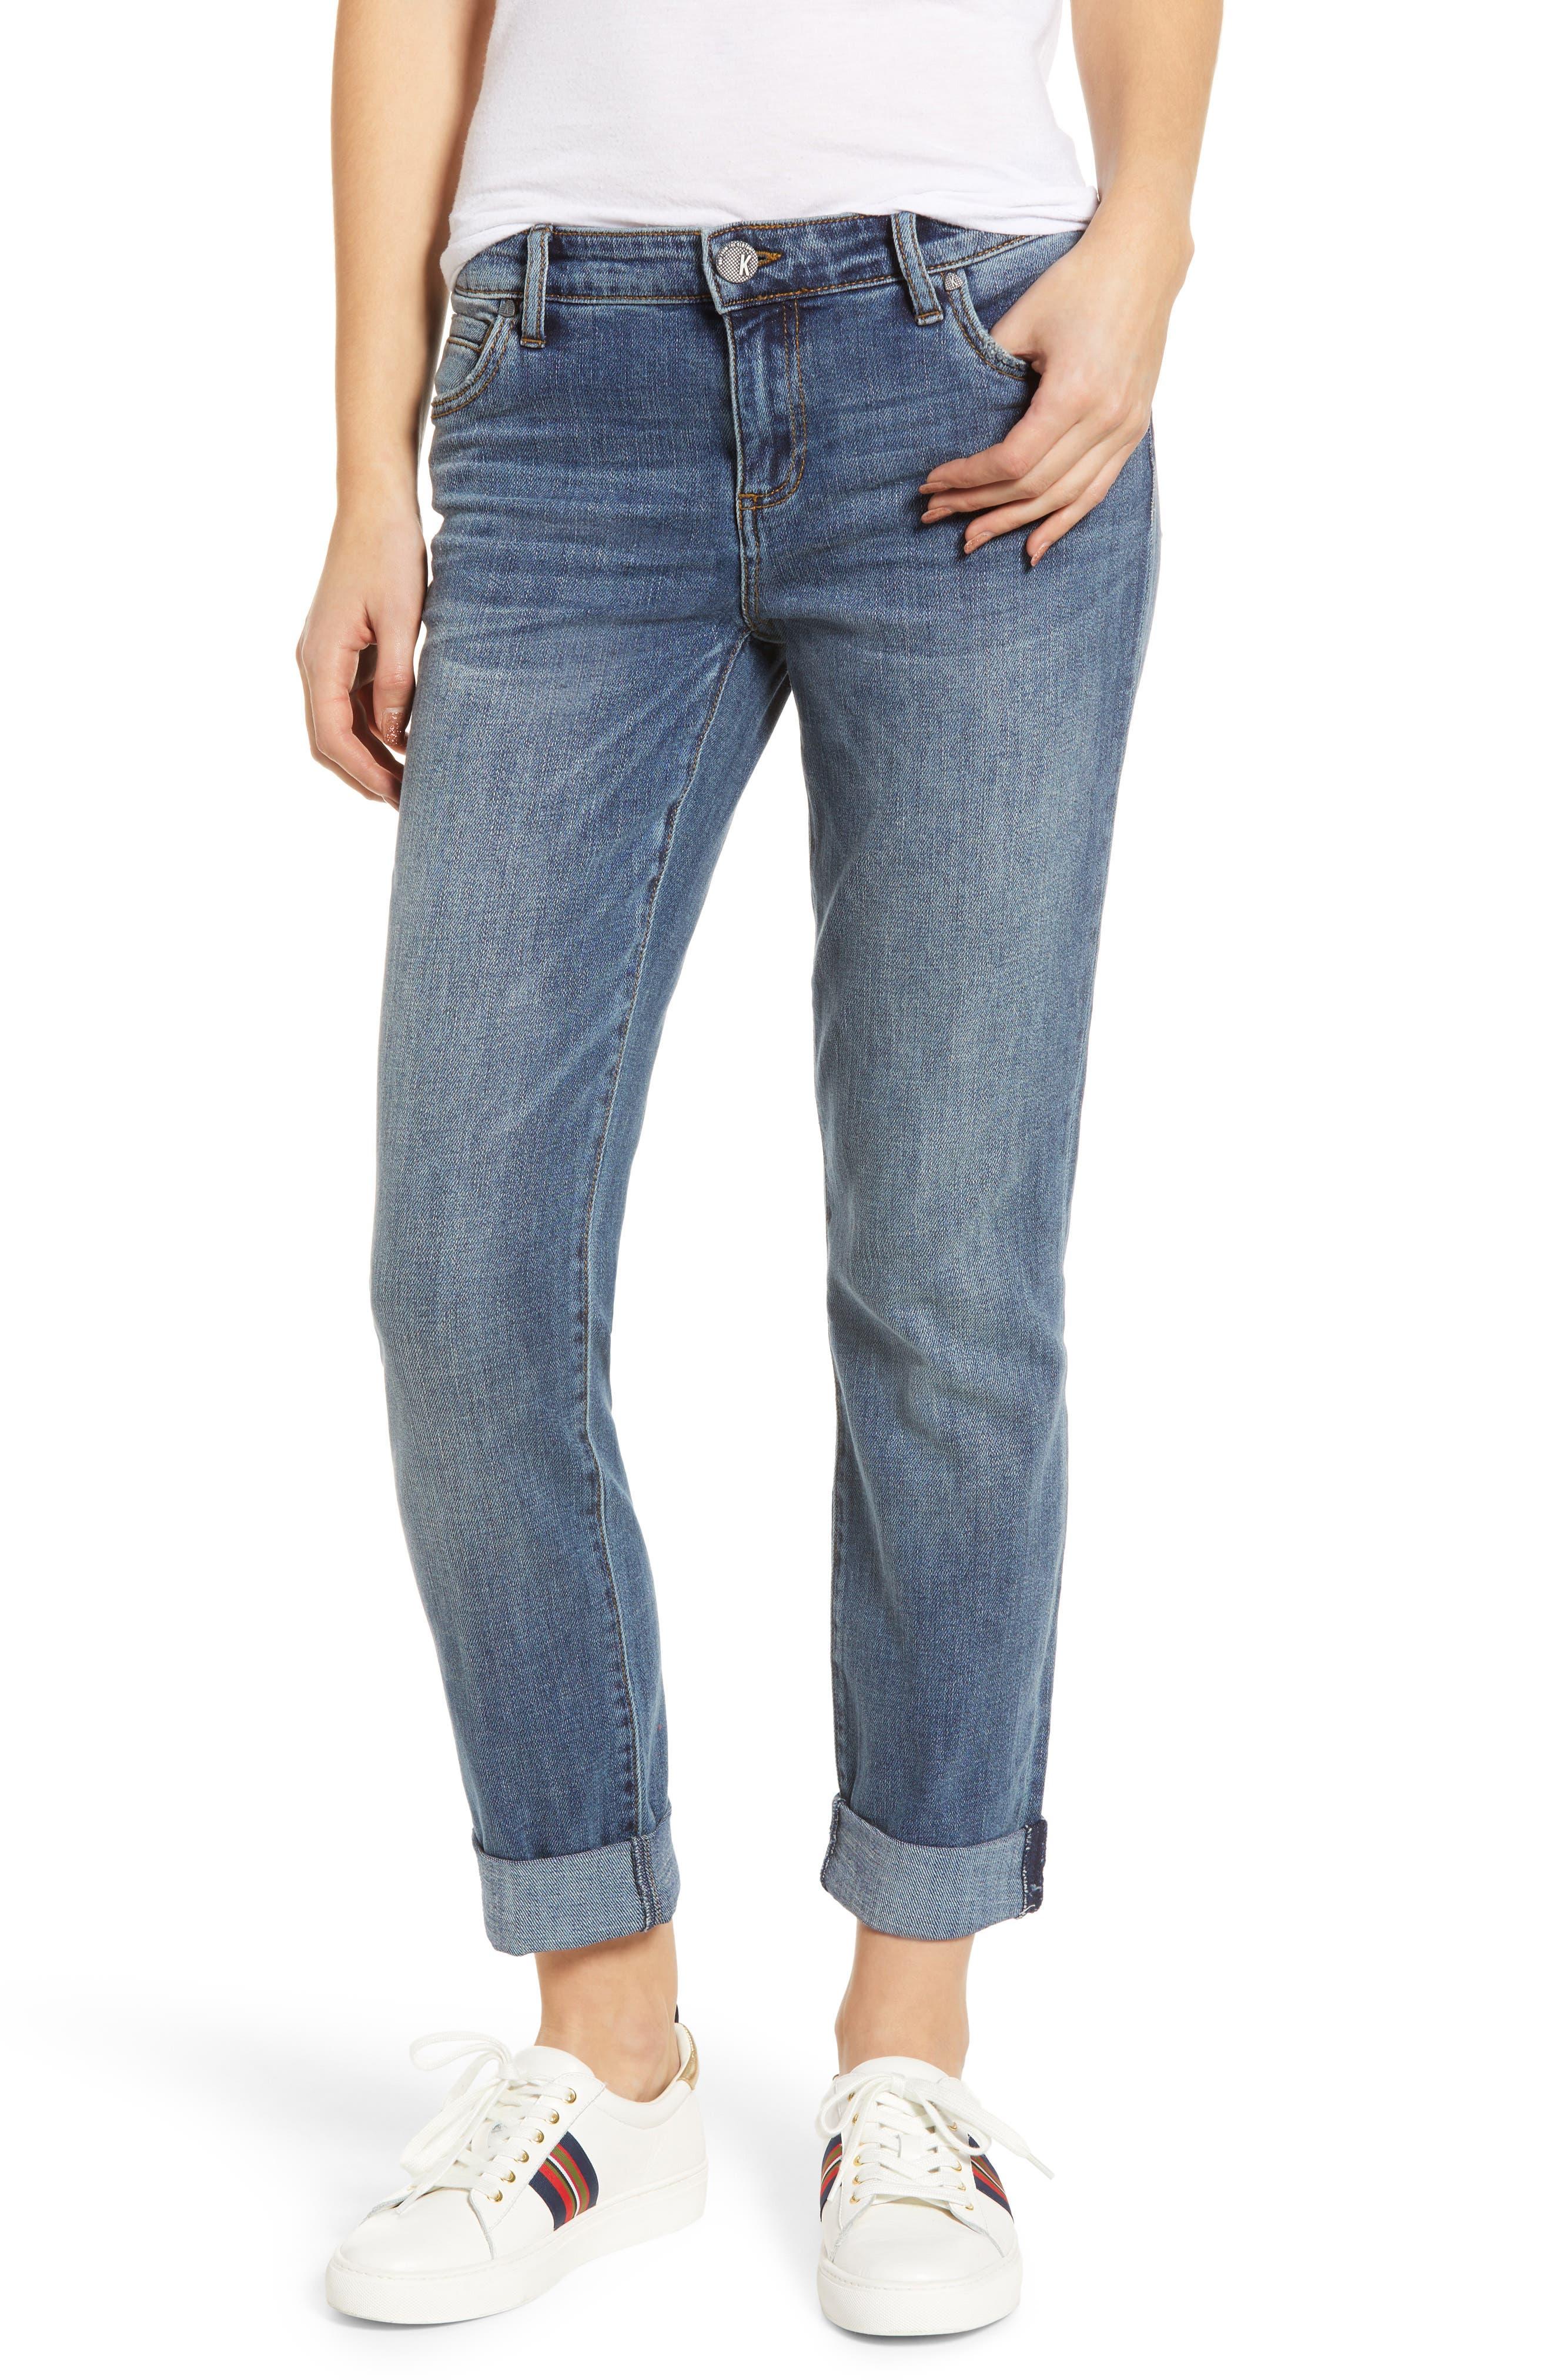 KUT FROM THE KLOTH Catherine Slim Boyfriend Jeans, Main, color, VERSION W/ MEDIUM BASE WASH